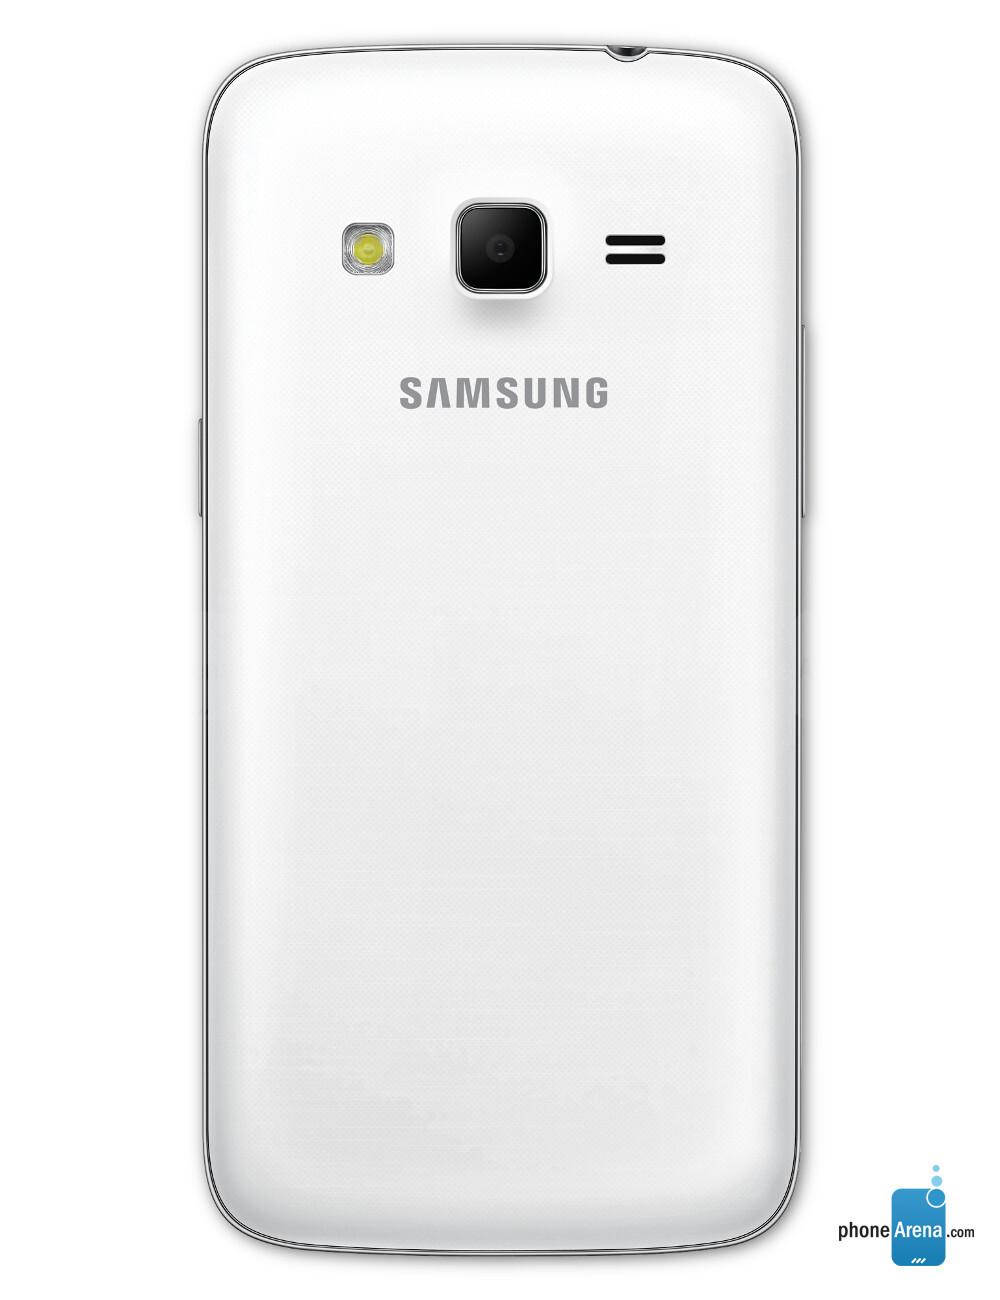 user manual samsung galaxy express 2